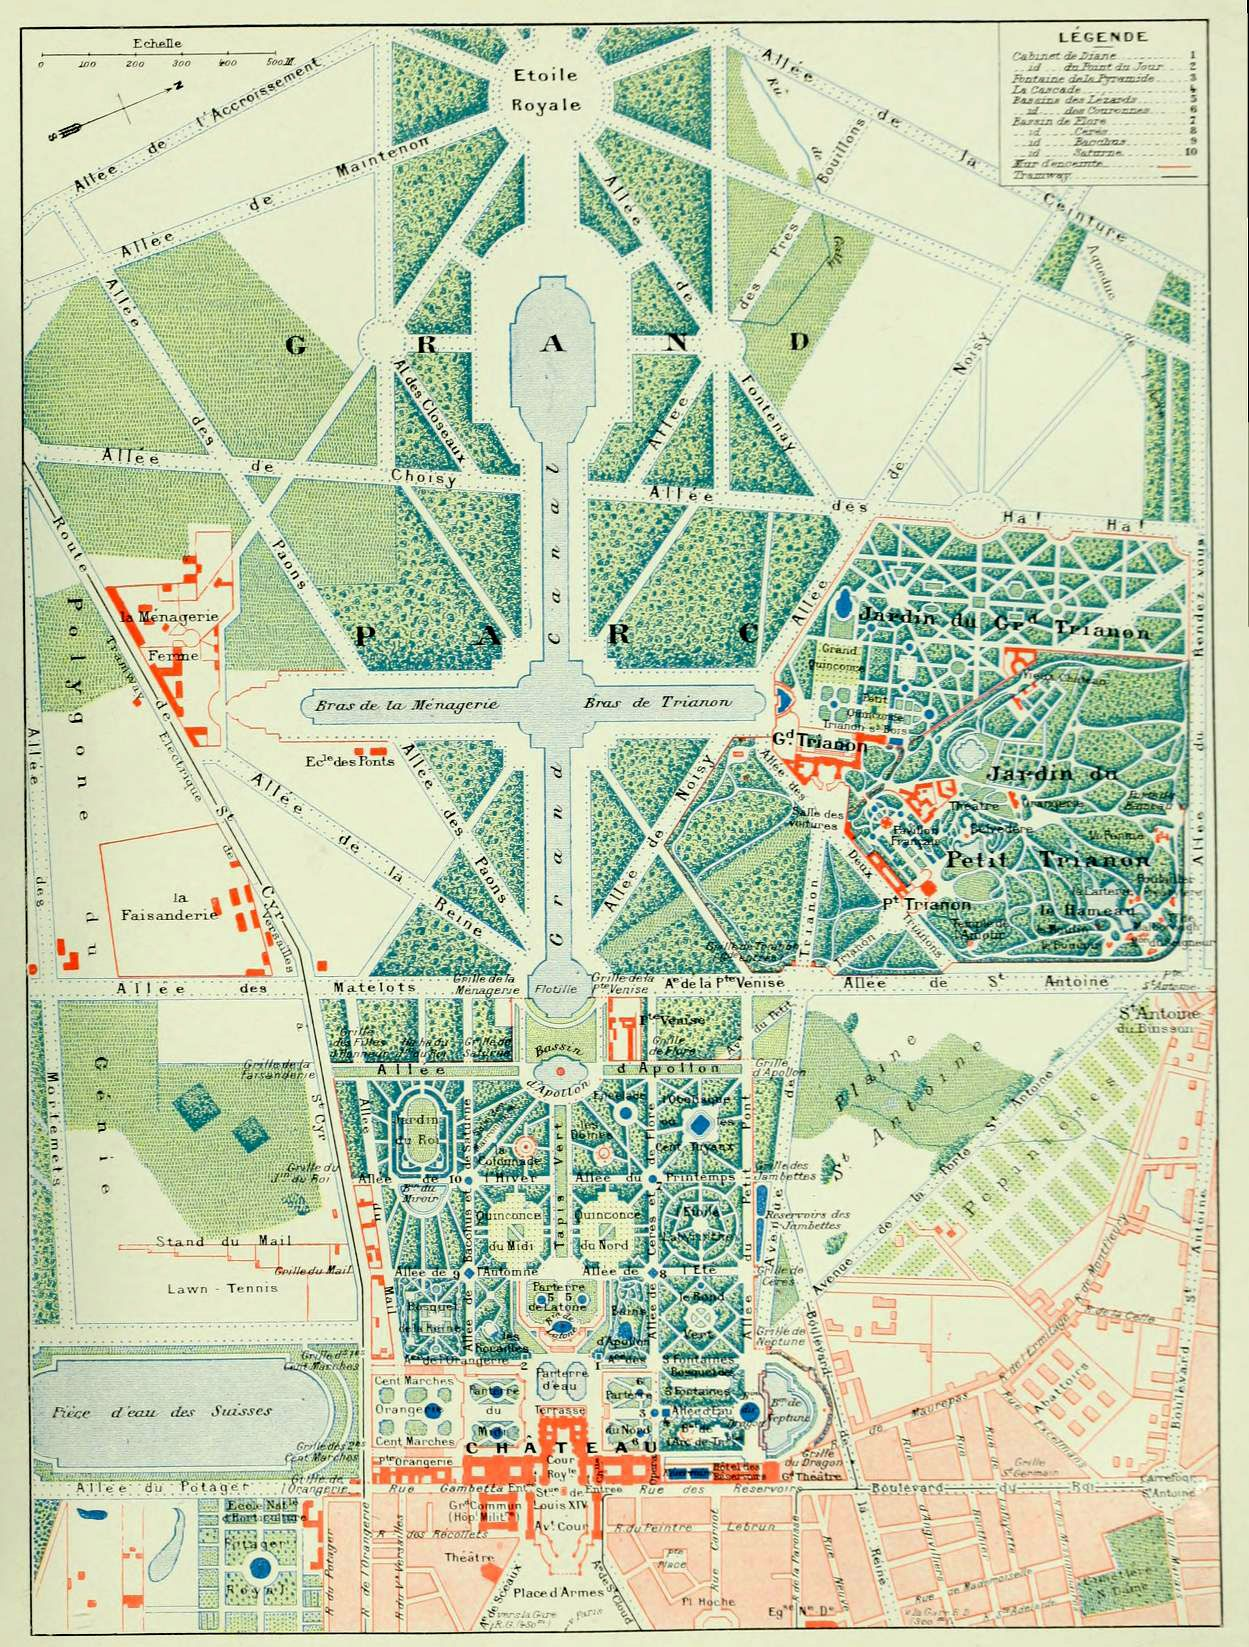 Plan of Versailles, 1685 Versailles, Dessin chateau